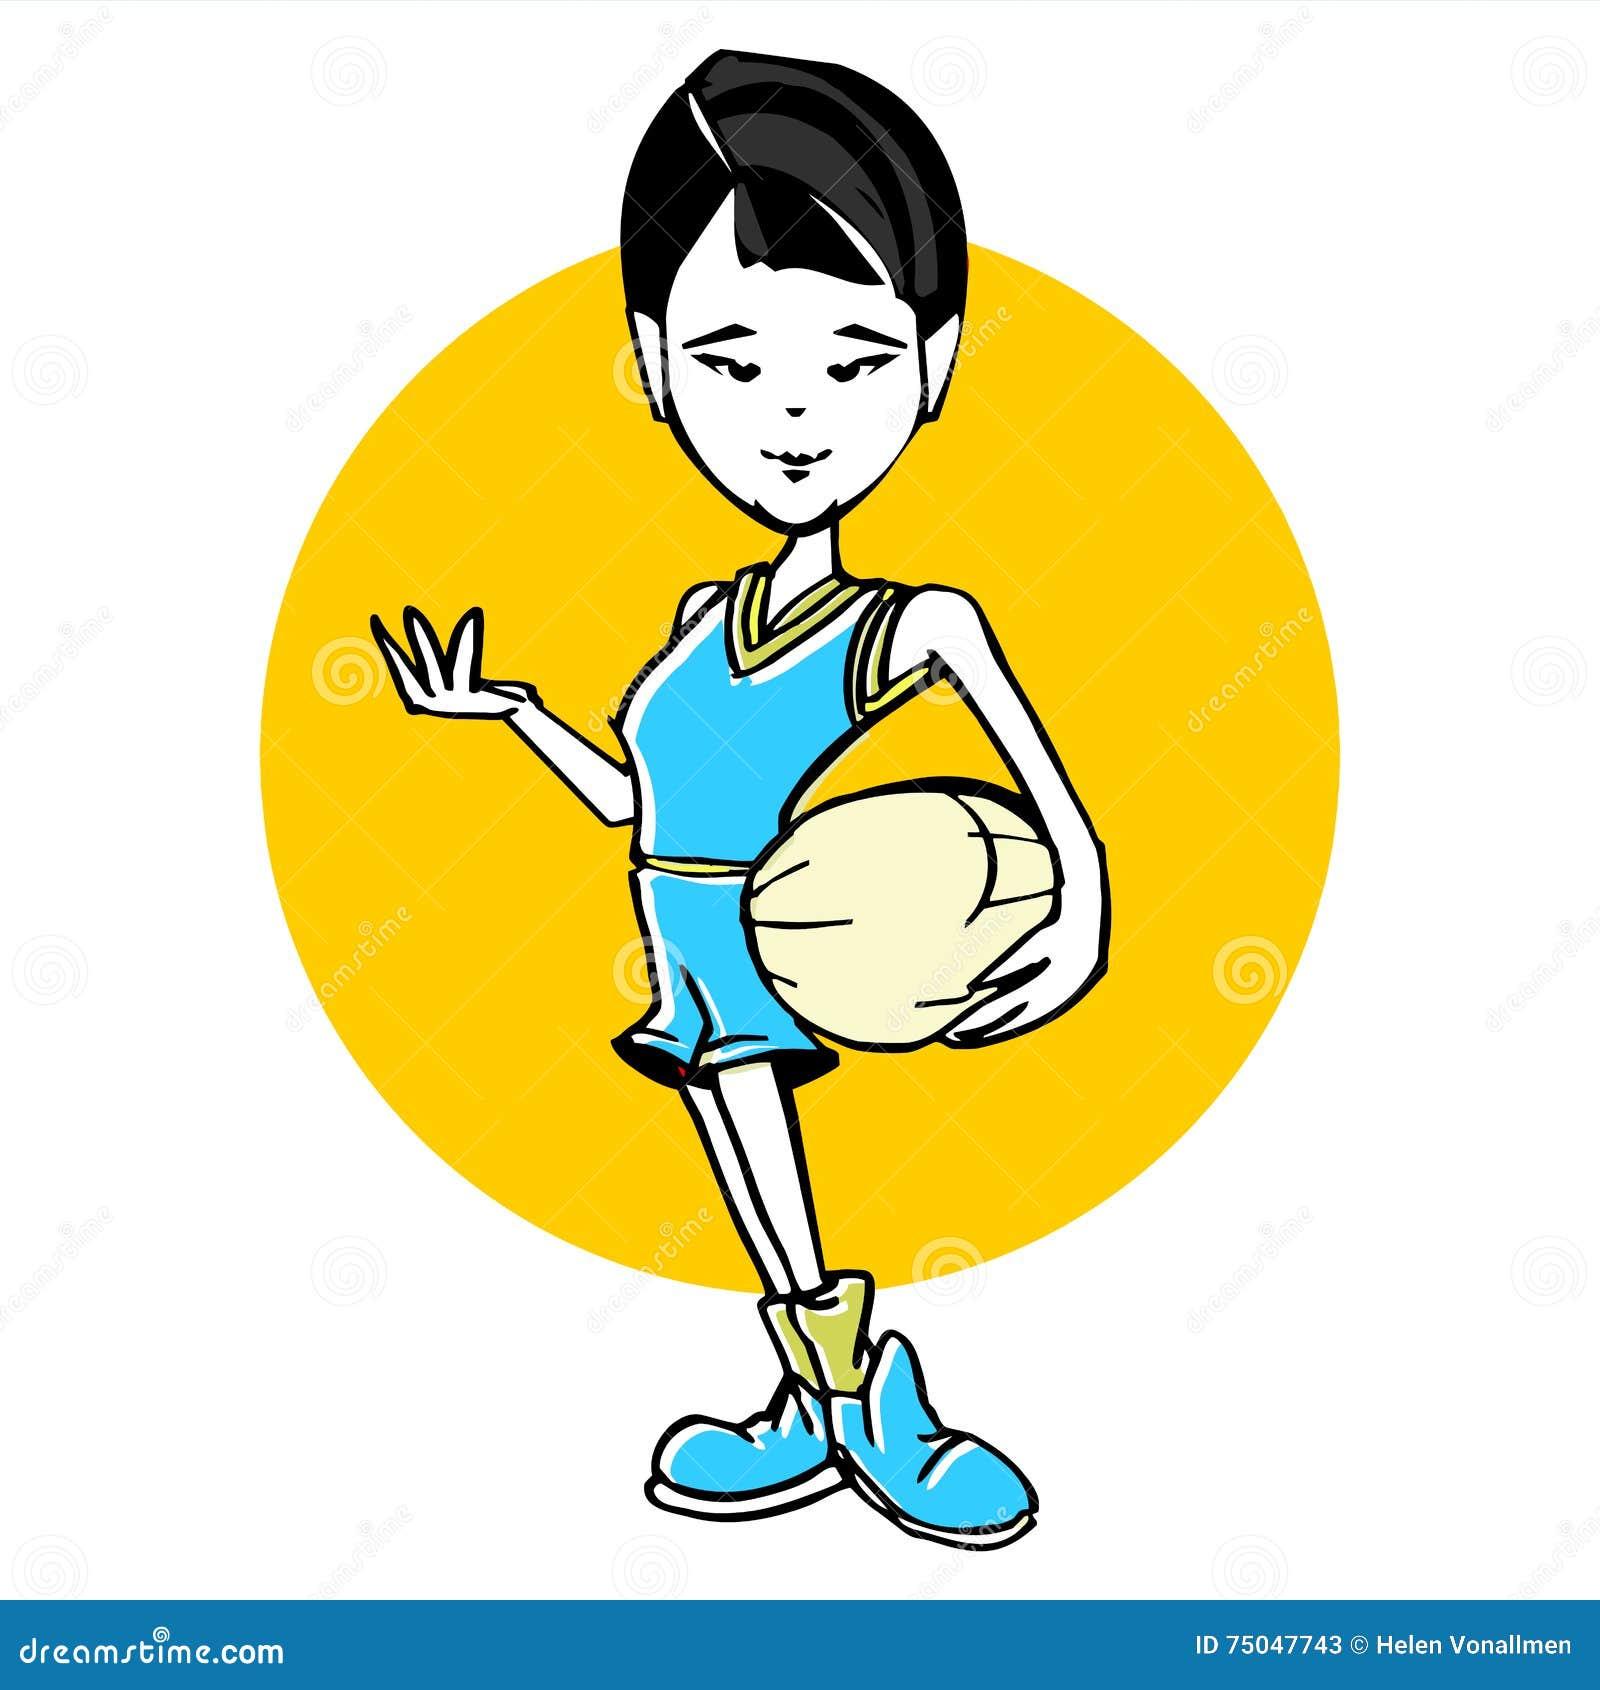 2e518f9087 Καρικατούρα του ασιατικού ύφους κινούμενων σχεδίων γυναικών καλαθοσφαίρισης